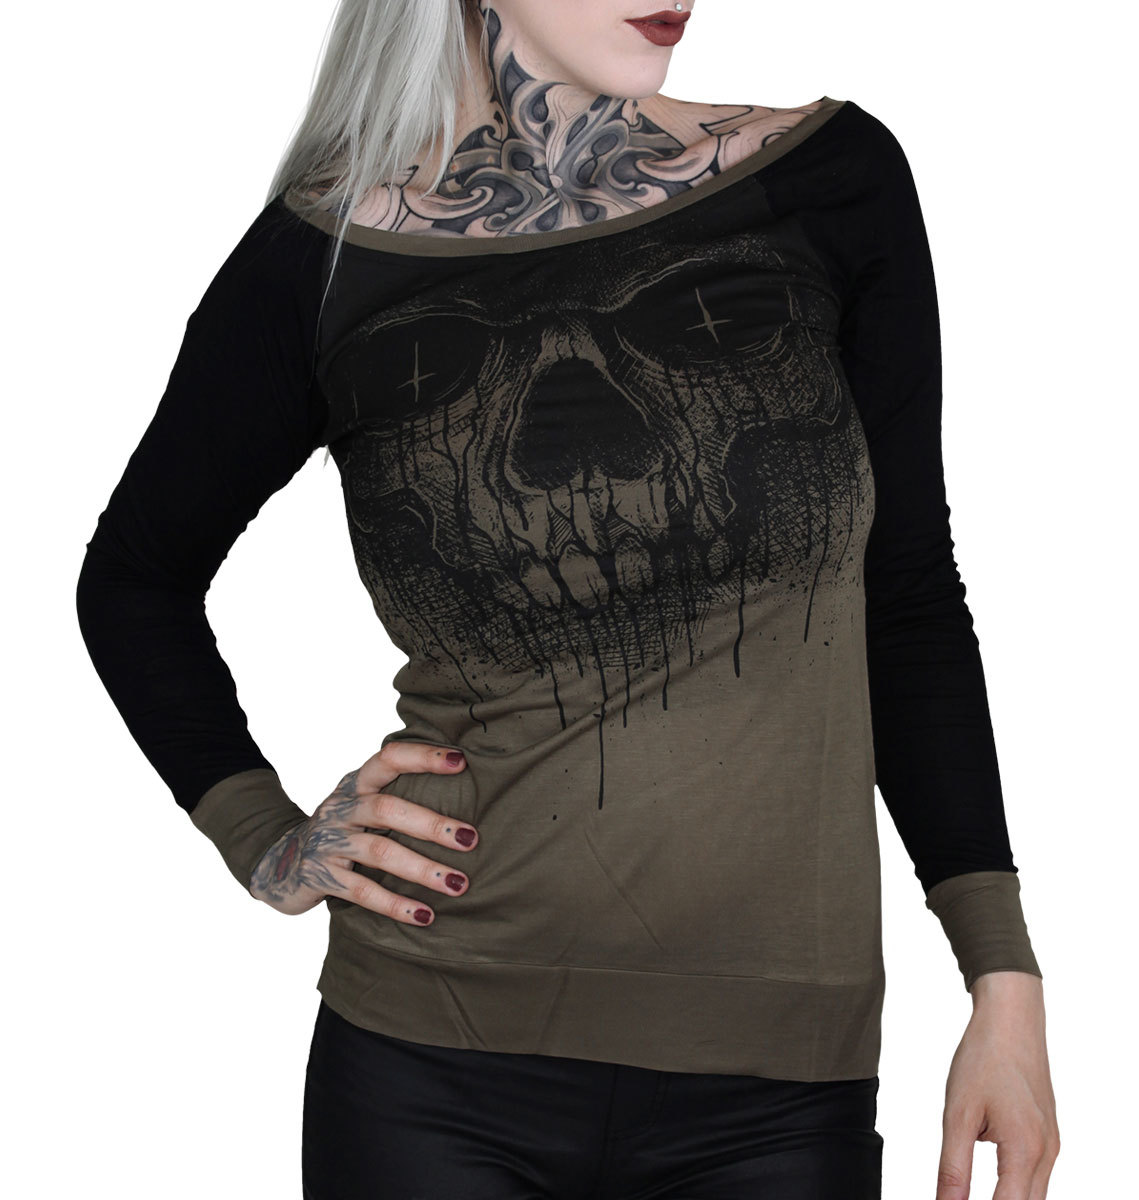 d7d7f68ed91e tričko dámske s dlhým rukávom HYRAW - CRIME - HY364 - metalshop.sk